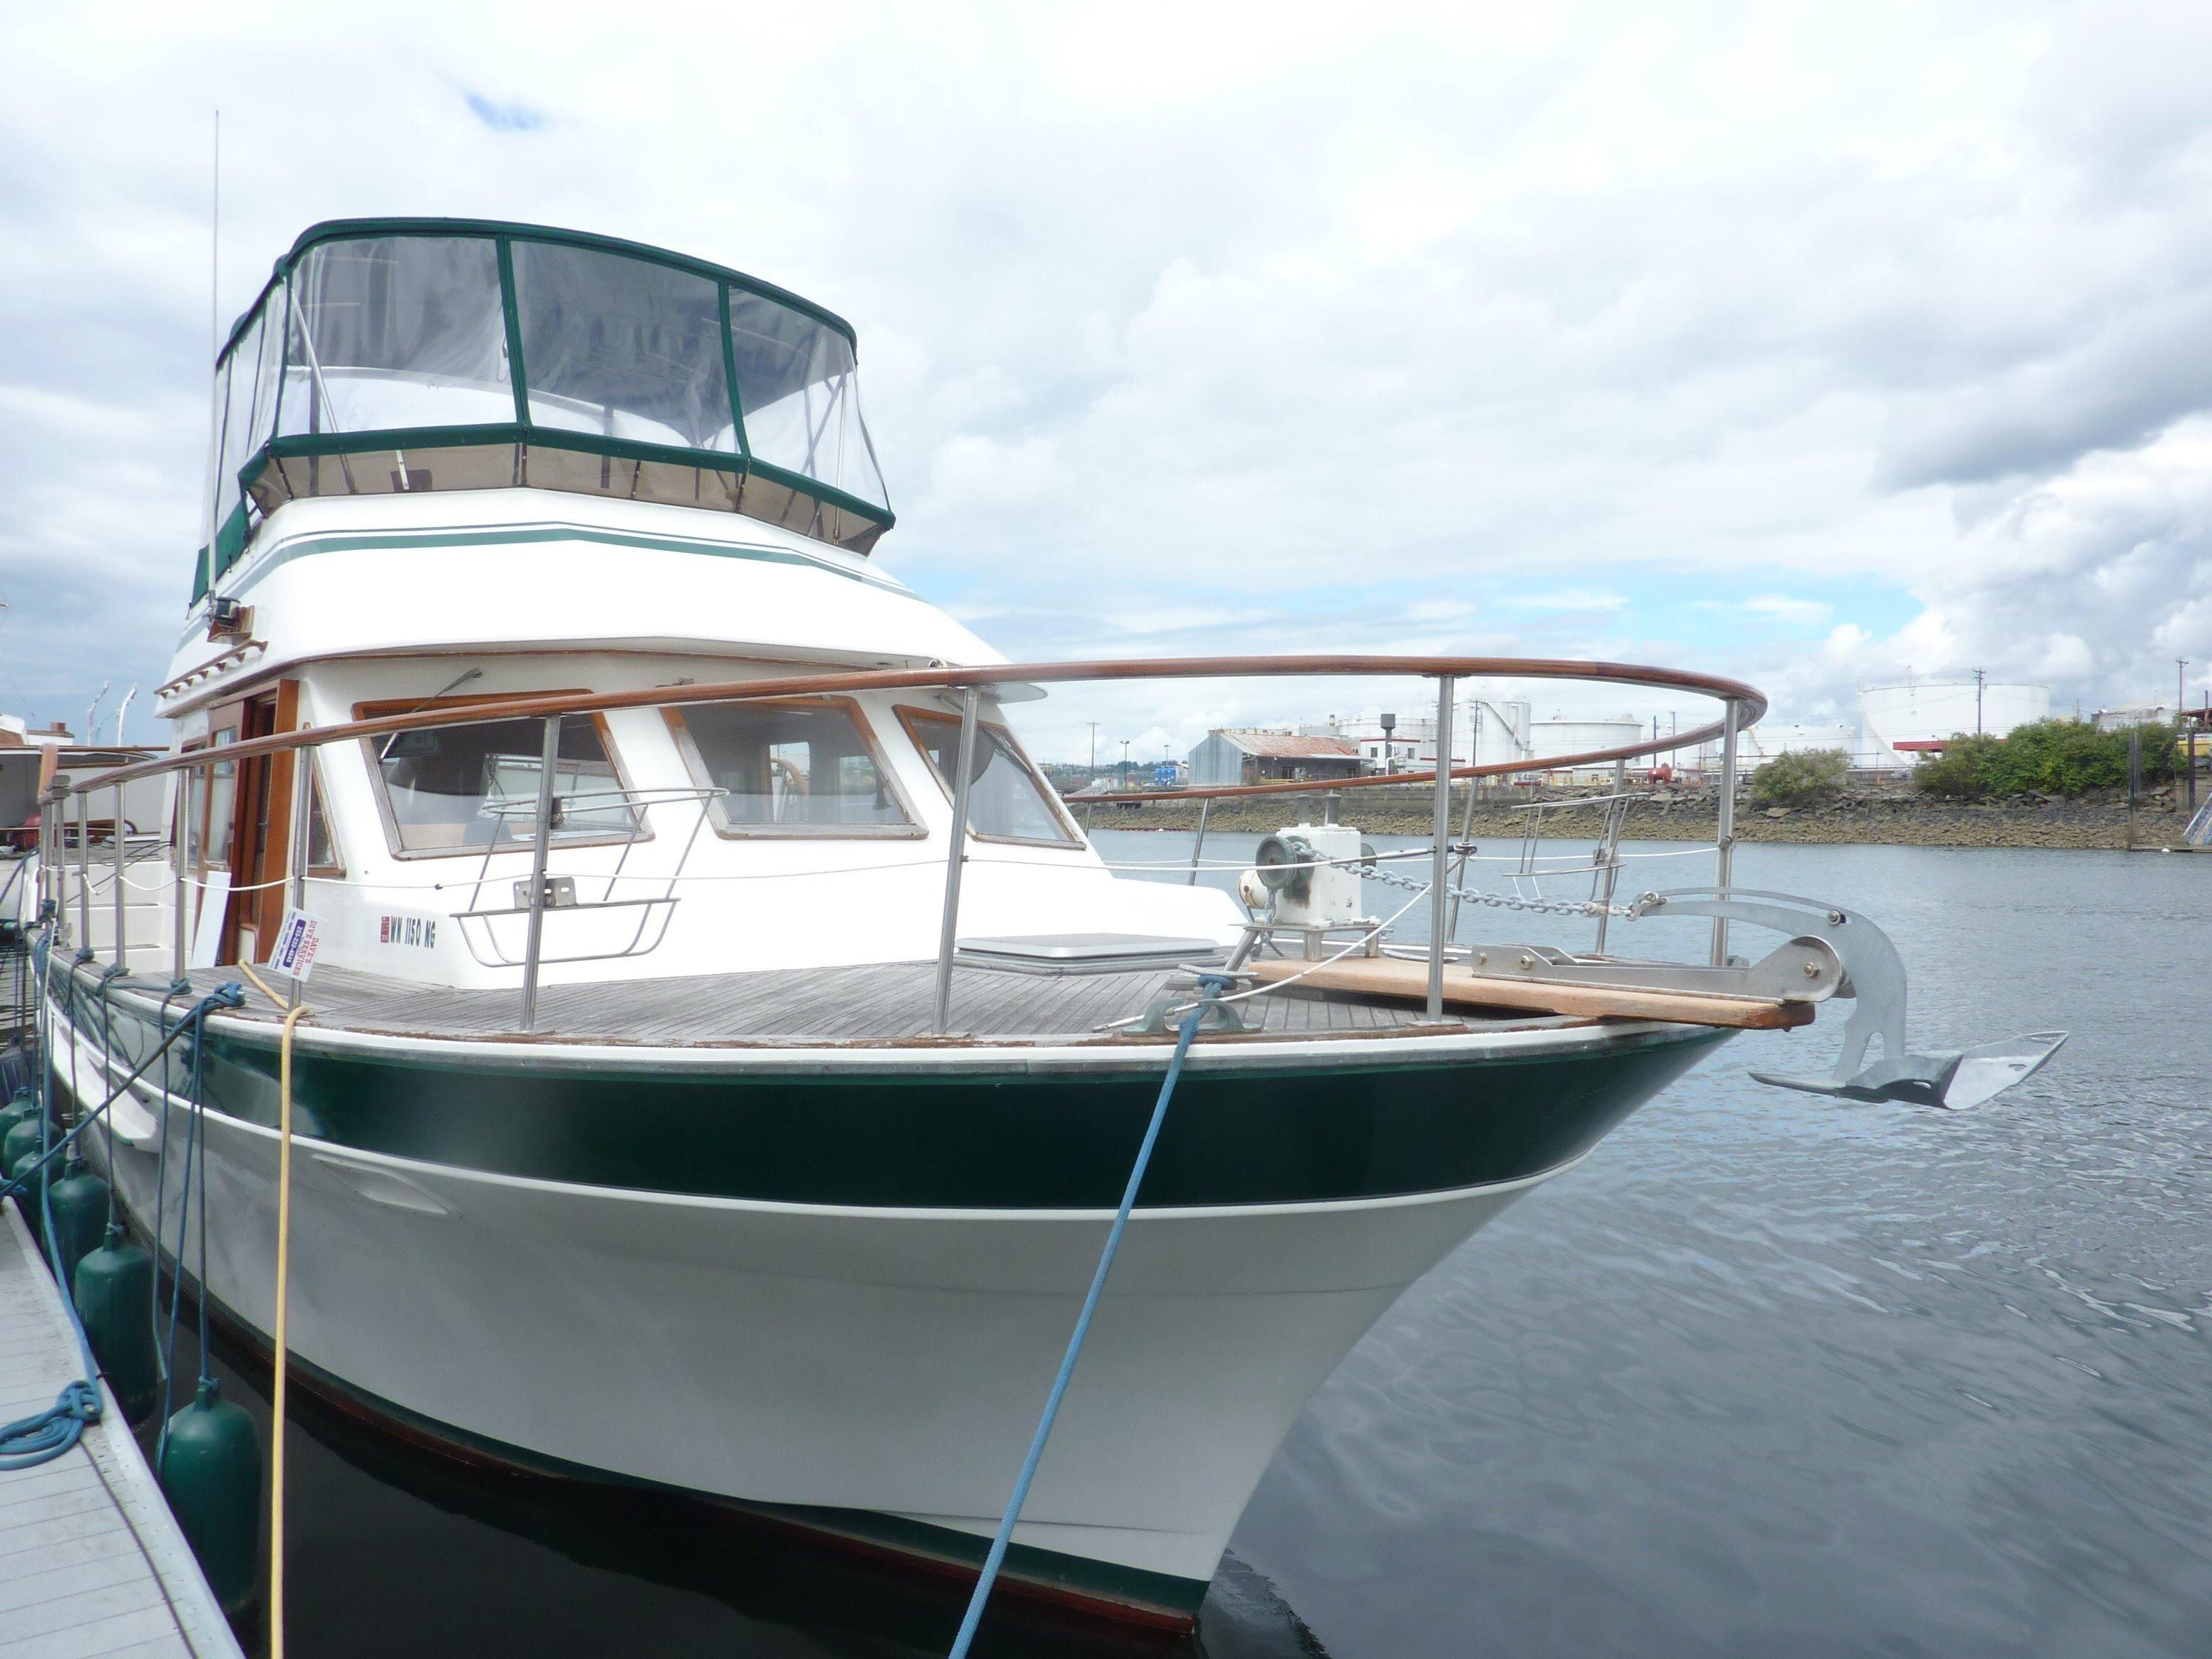 top cruiser hard prod classic admiral person inboard cabins max product cabin boats sa